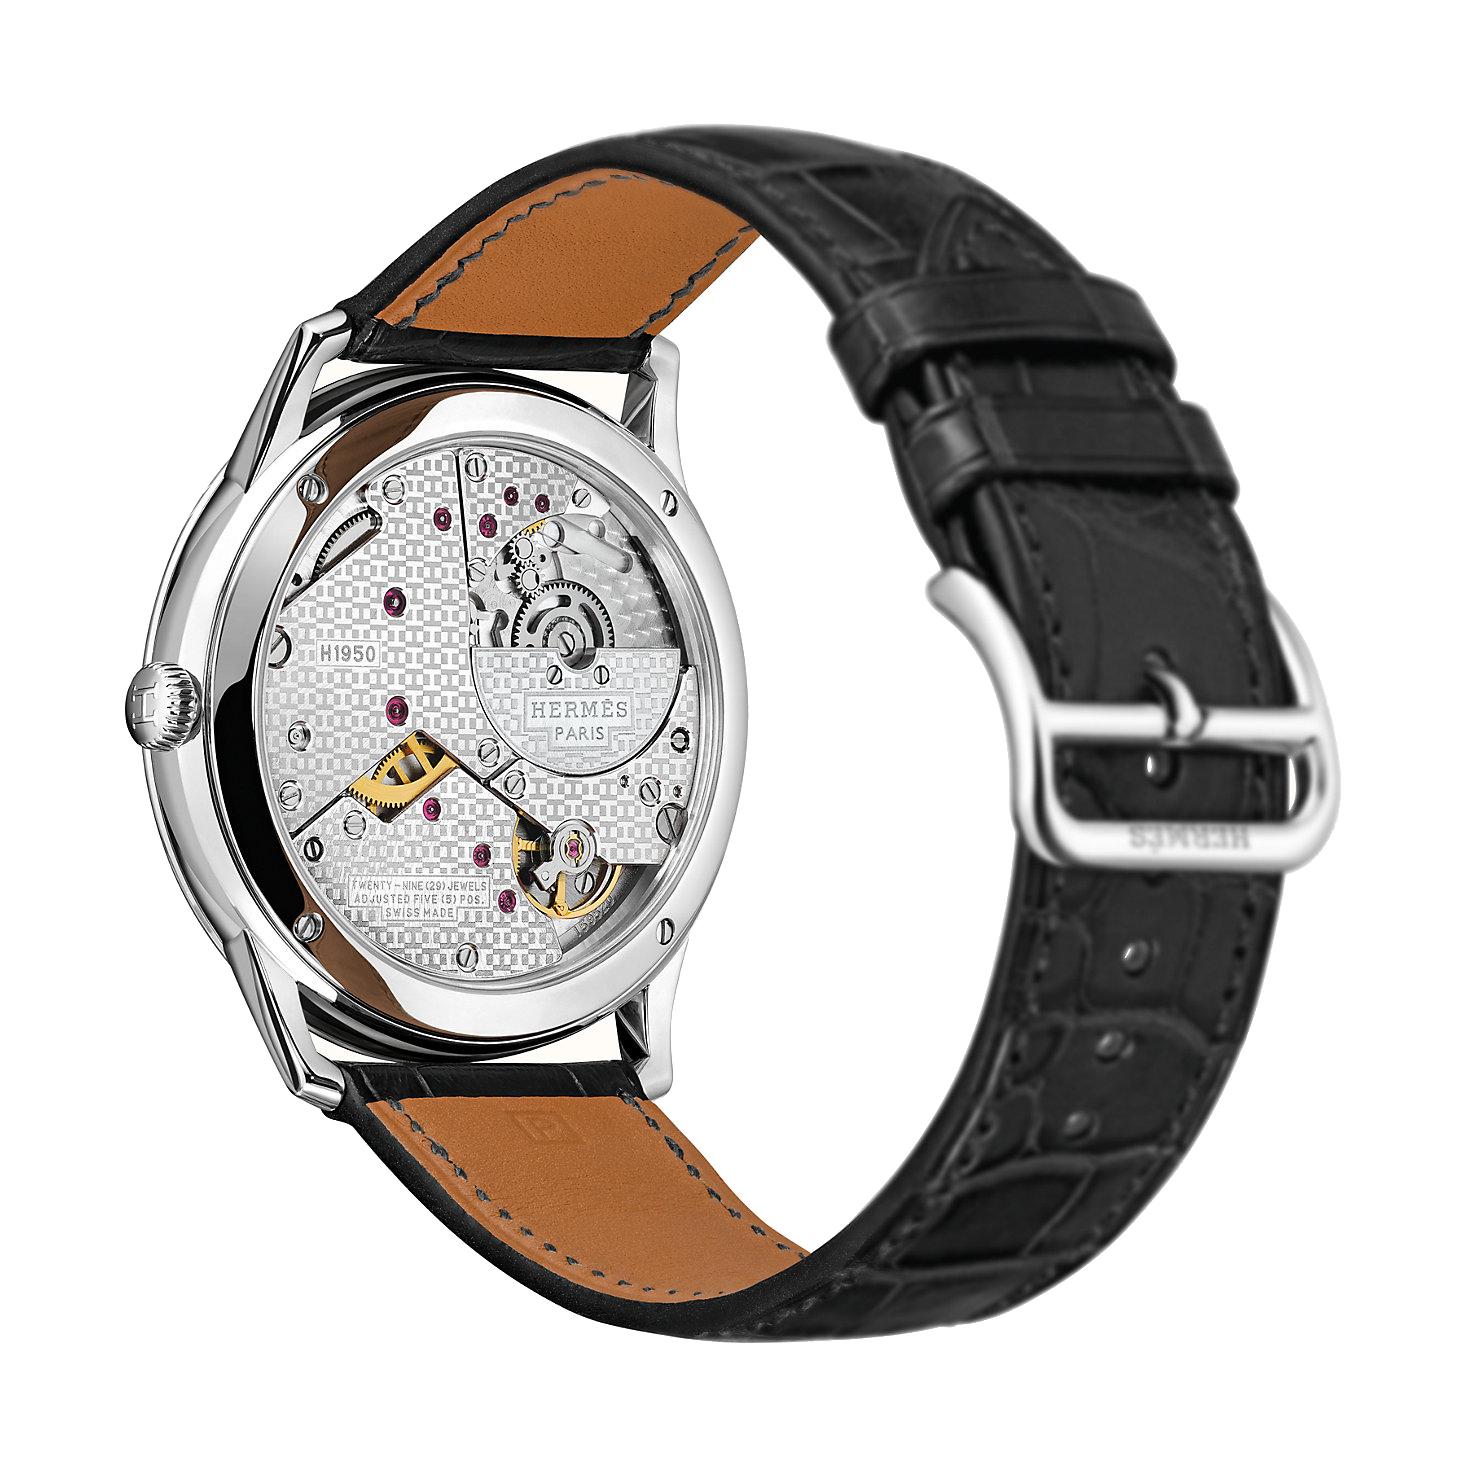 montre-slim-d-hermes-395mm--041759WW00-back-3-300-0-1466-1466_b